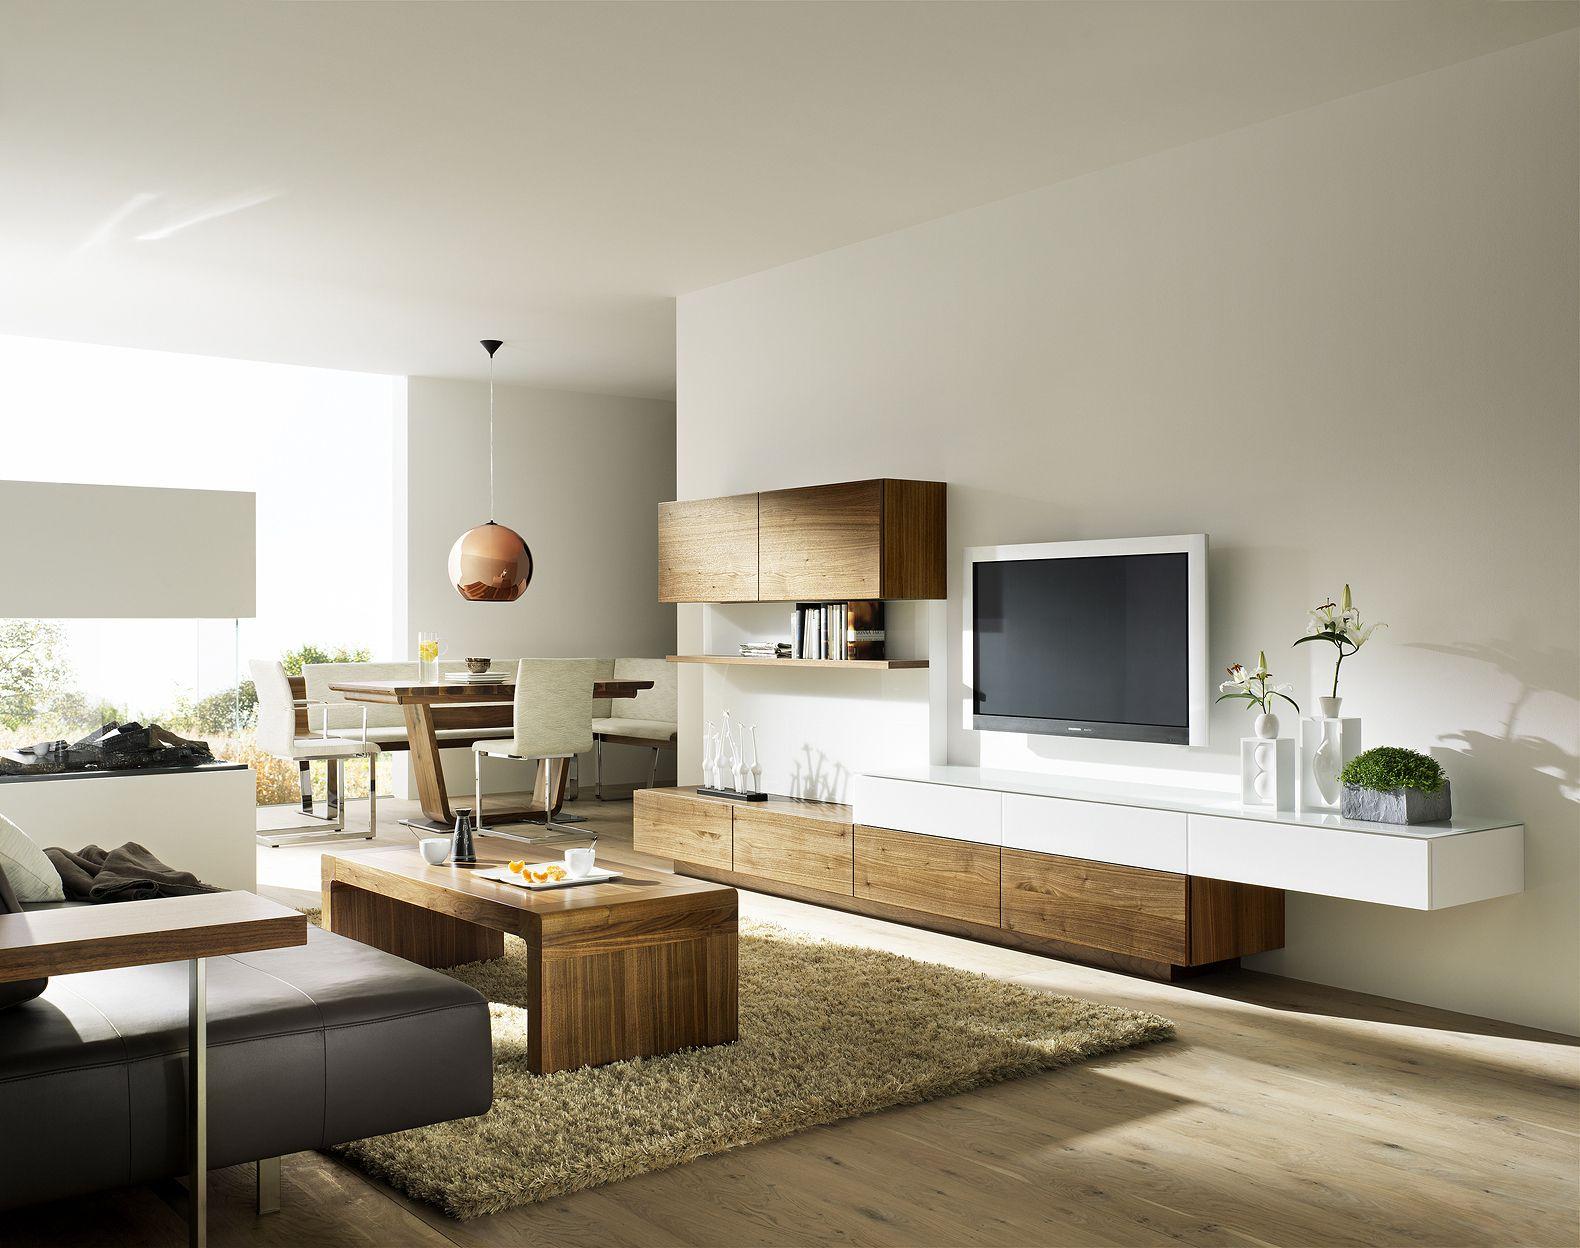 Möbel Massivholz Hersteller holz möbel handgefertigt aus massivholz möbelhaus messmer